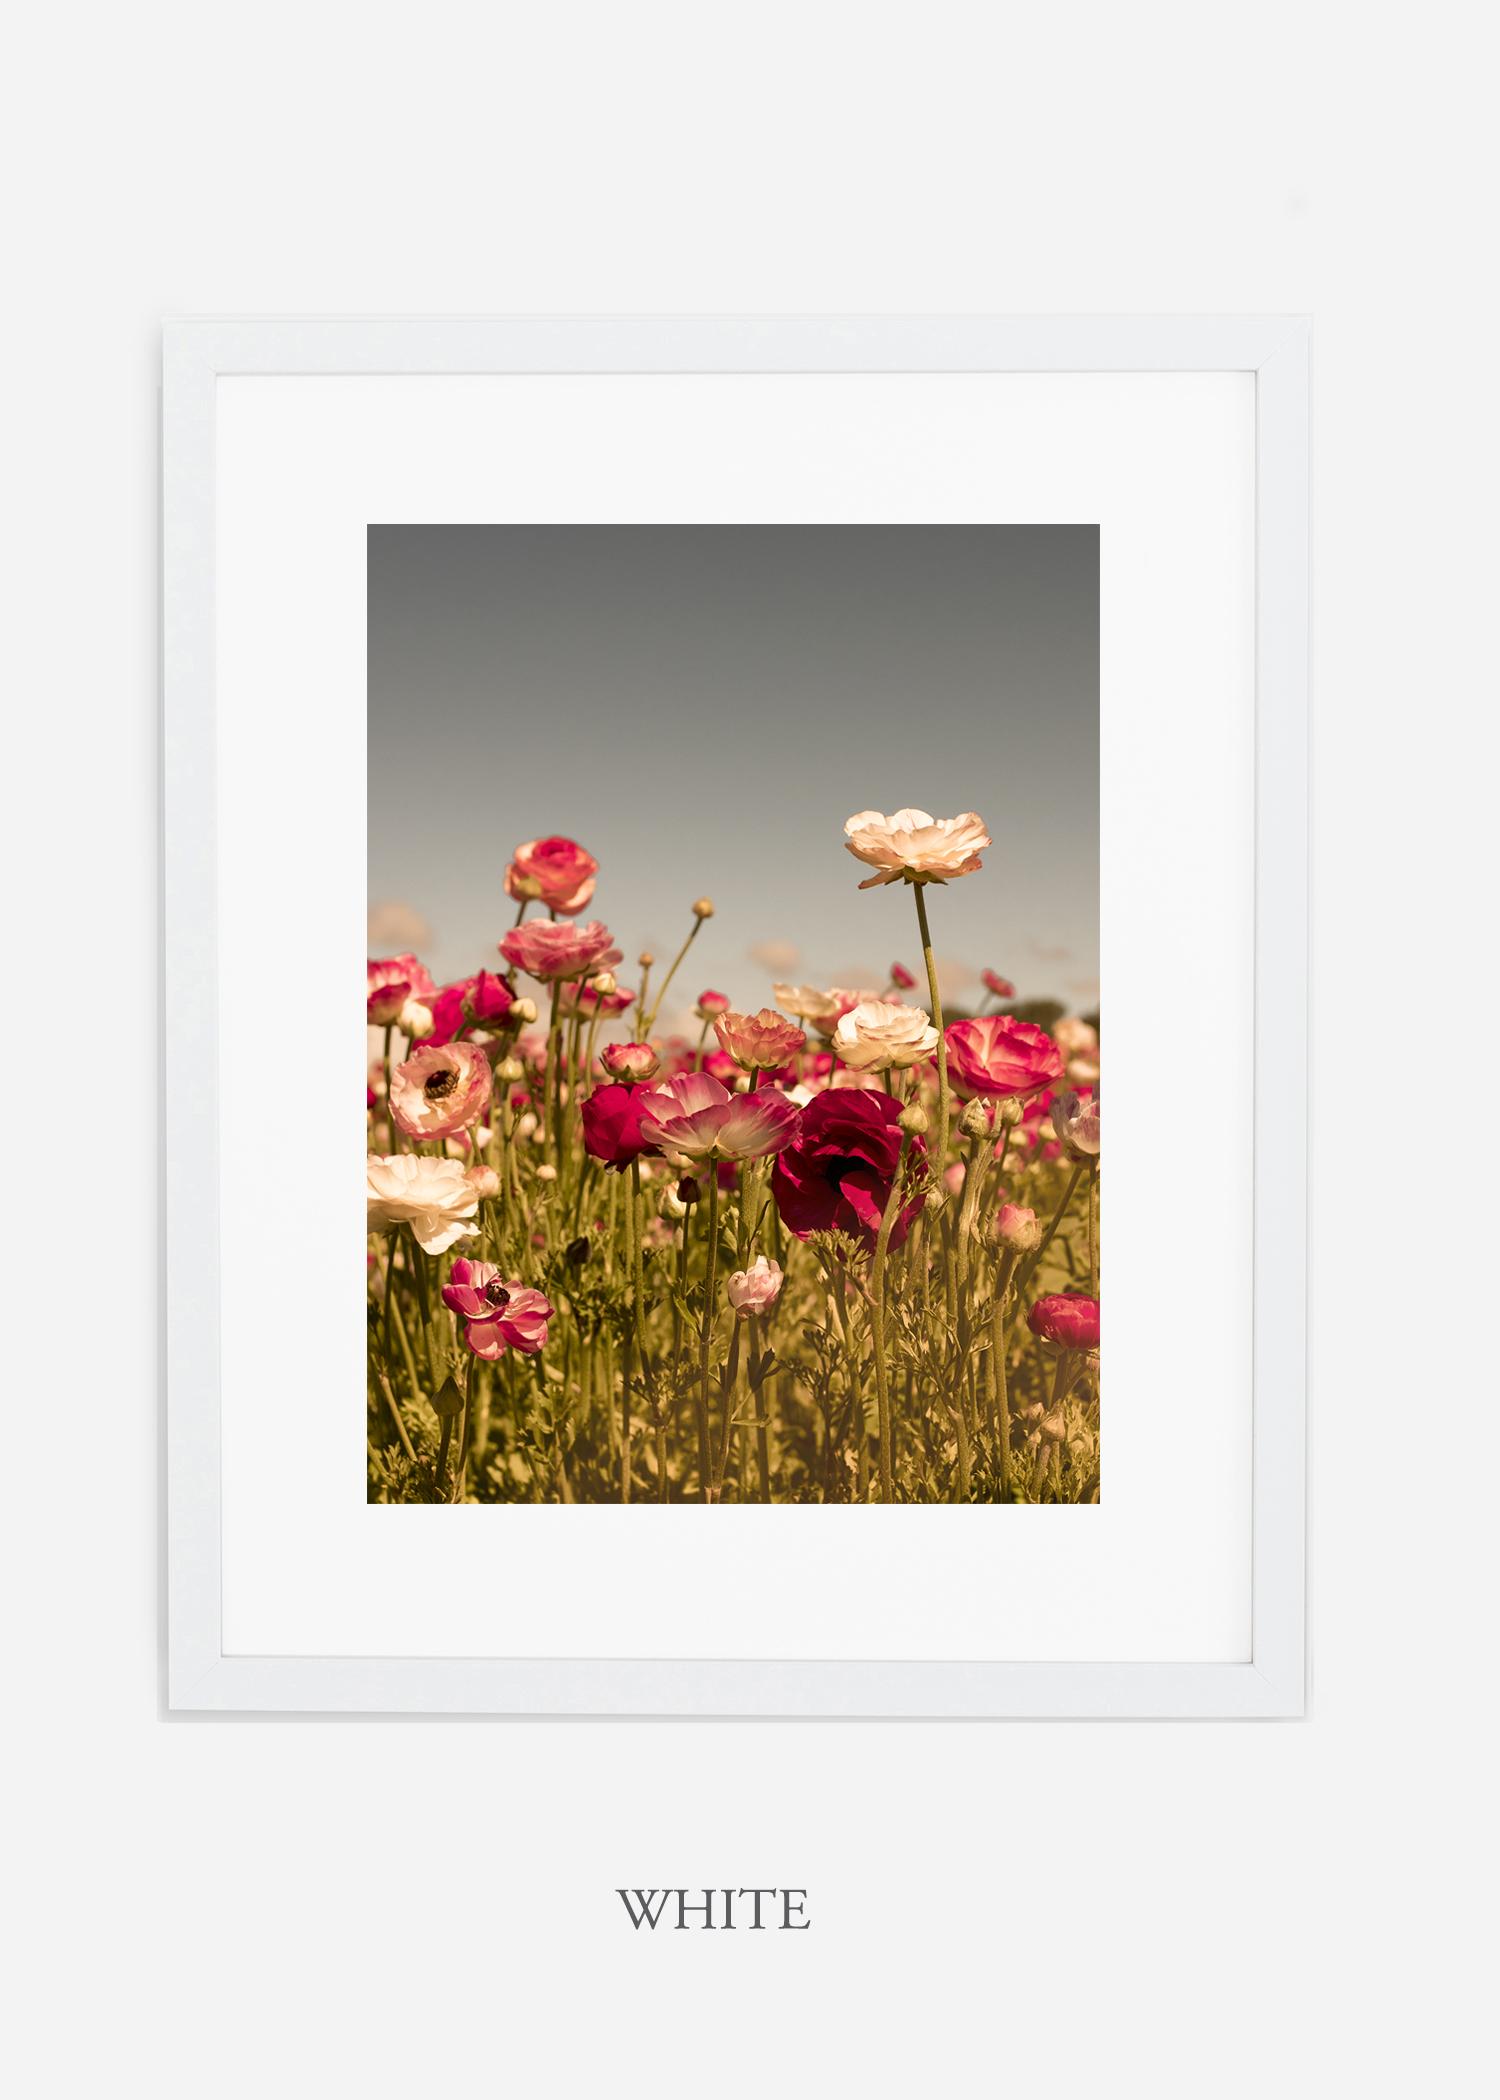 wilder-california-Floral-No.3-white-frame-mat-interior-design-botanical-print-art-floral-art.jpg